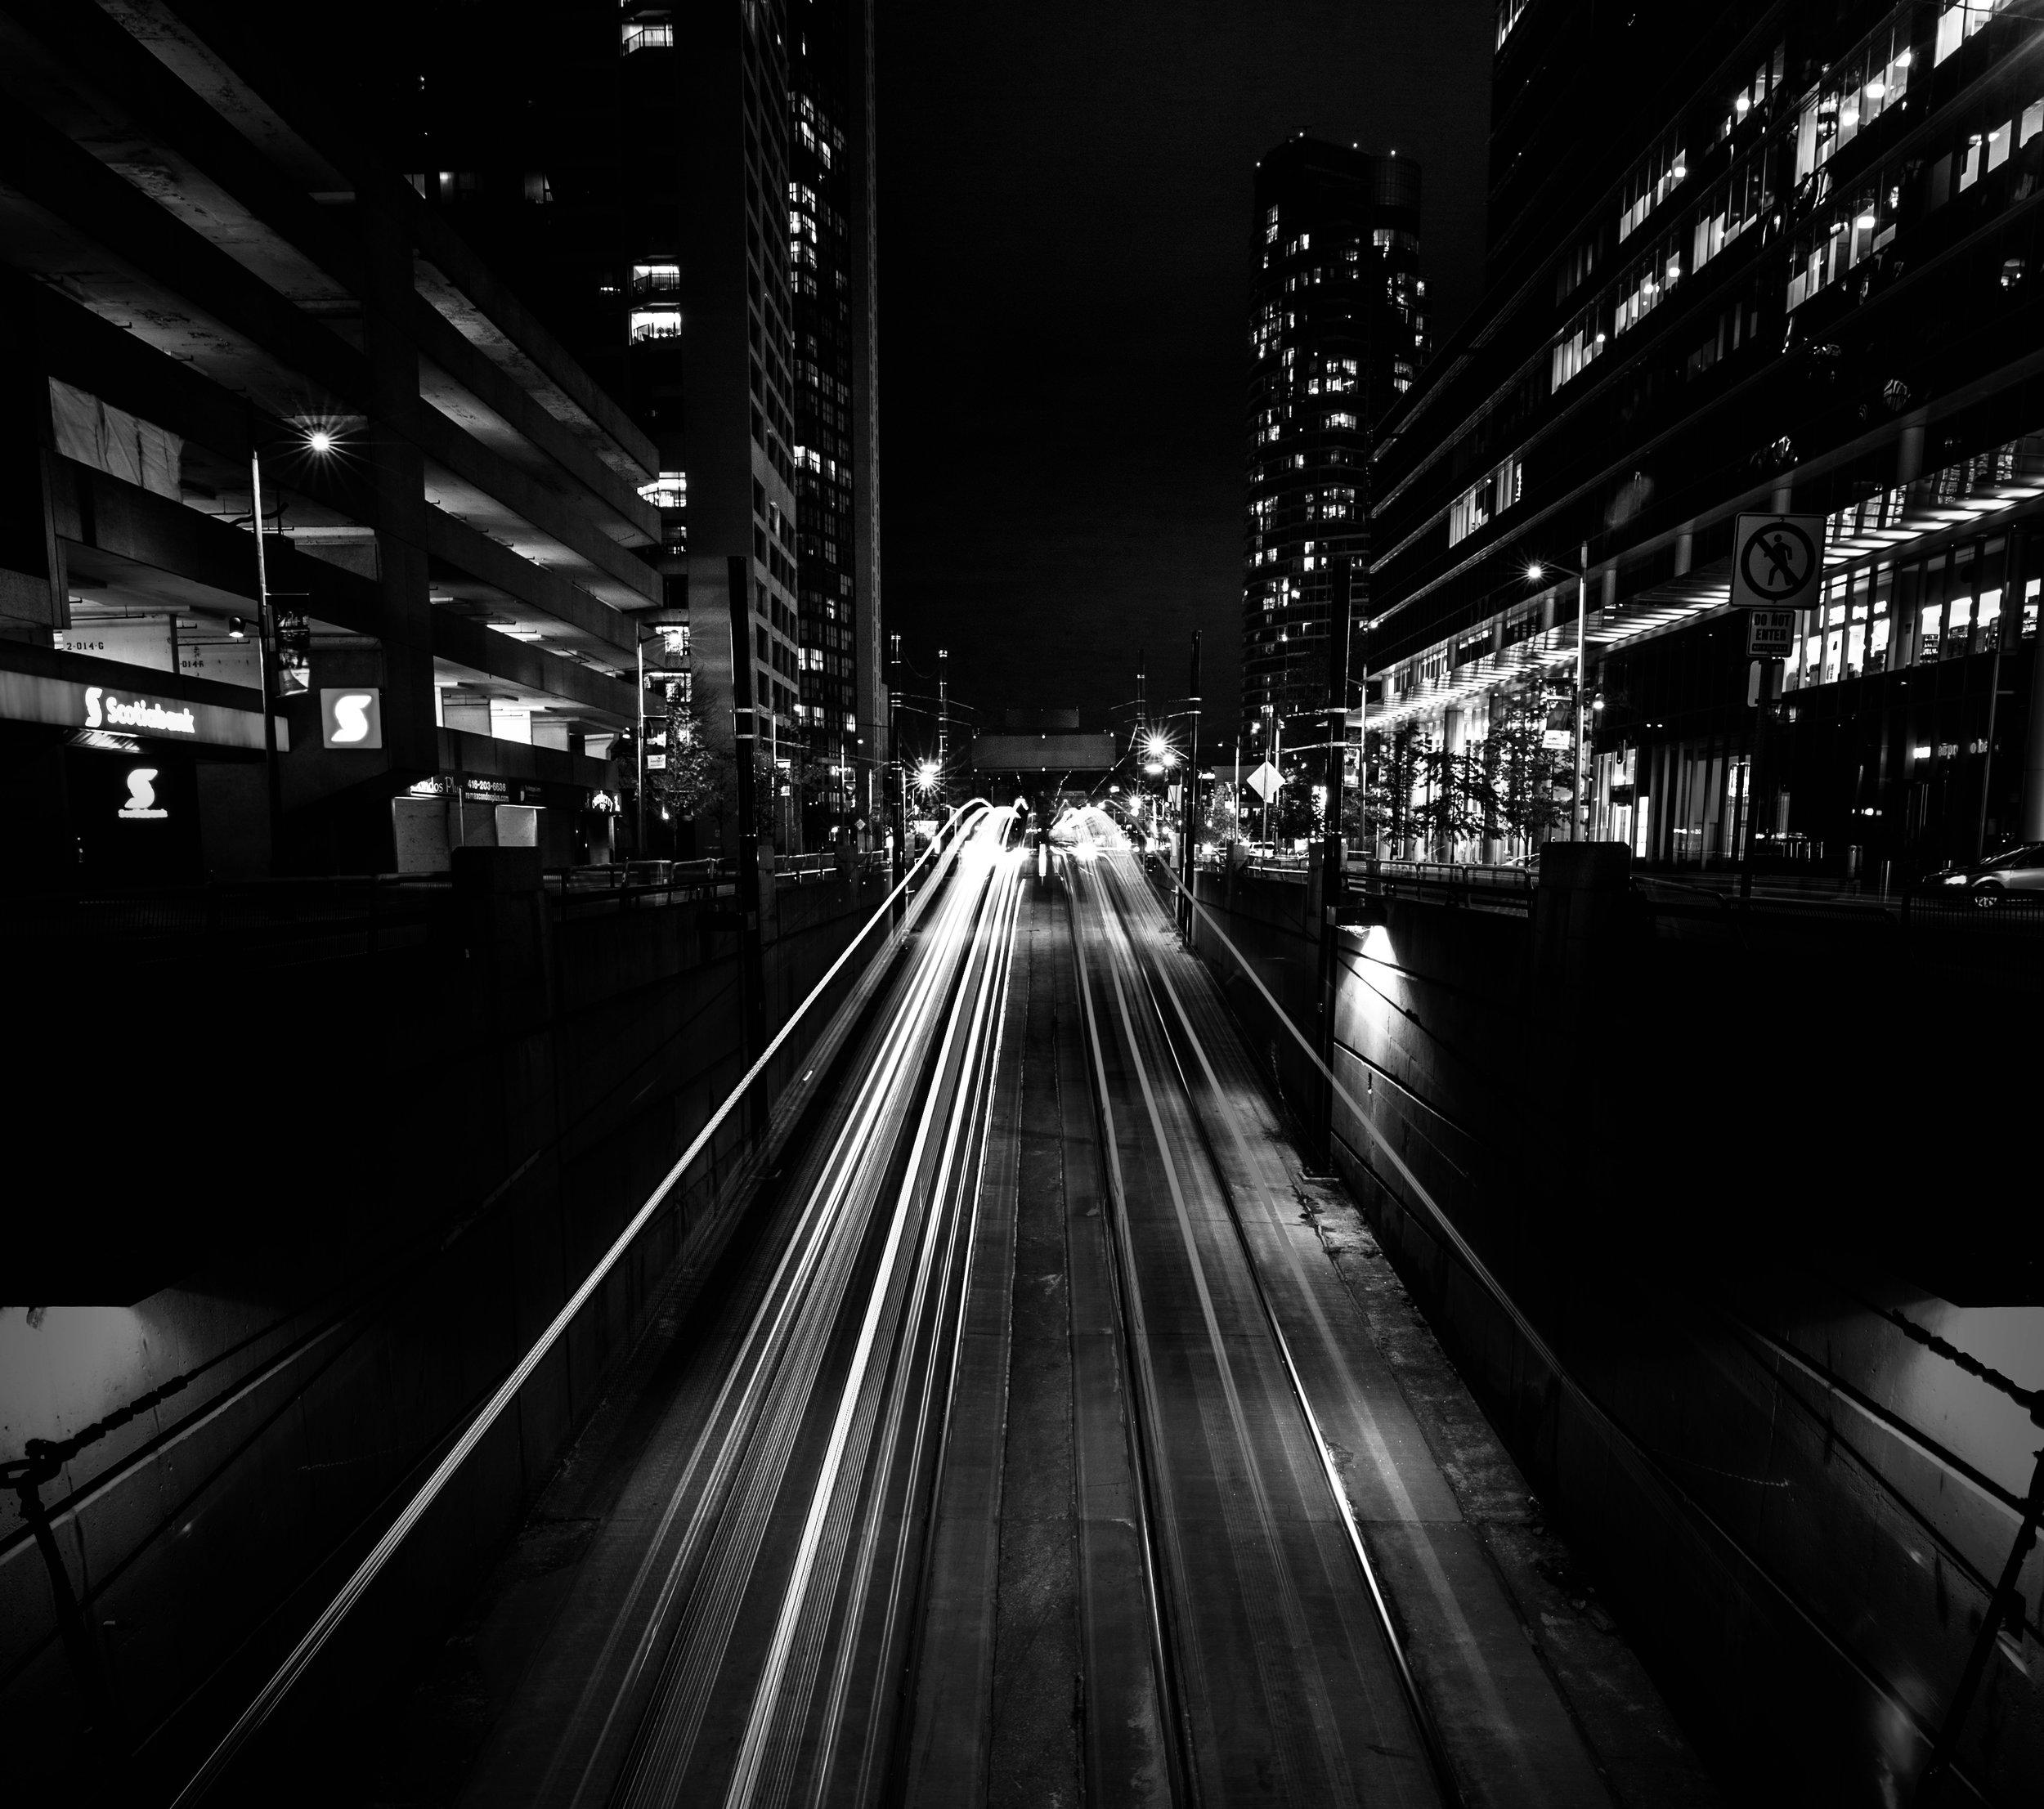 Photo by  Filip Mroz  on  Unsplash